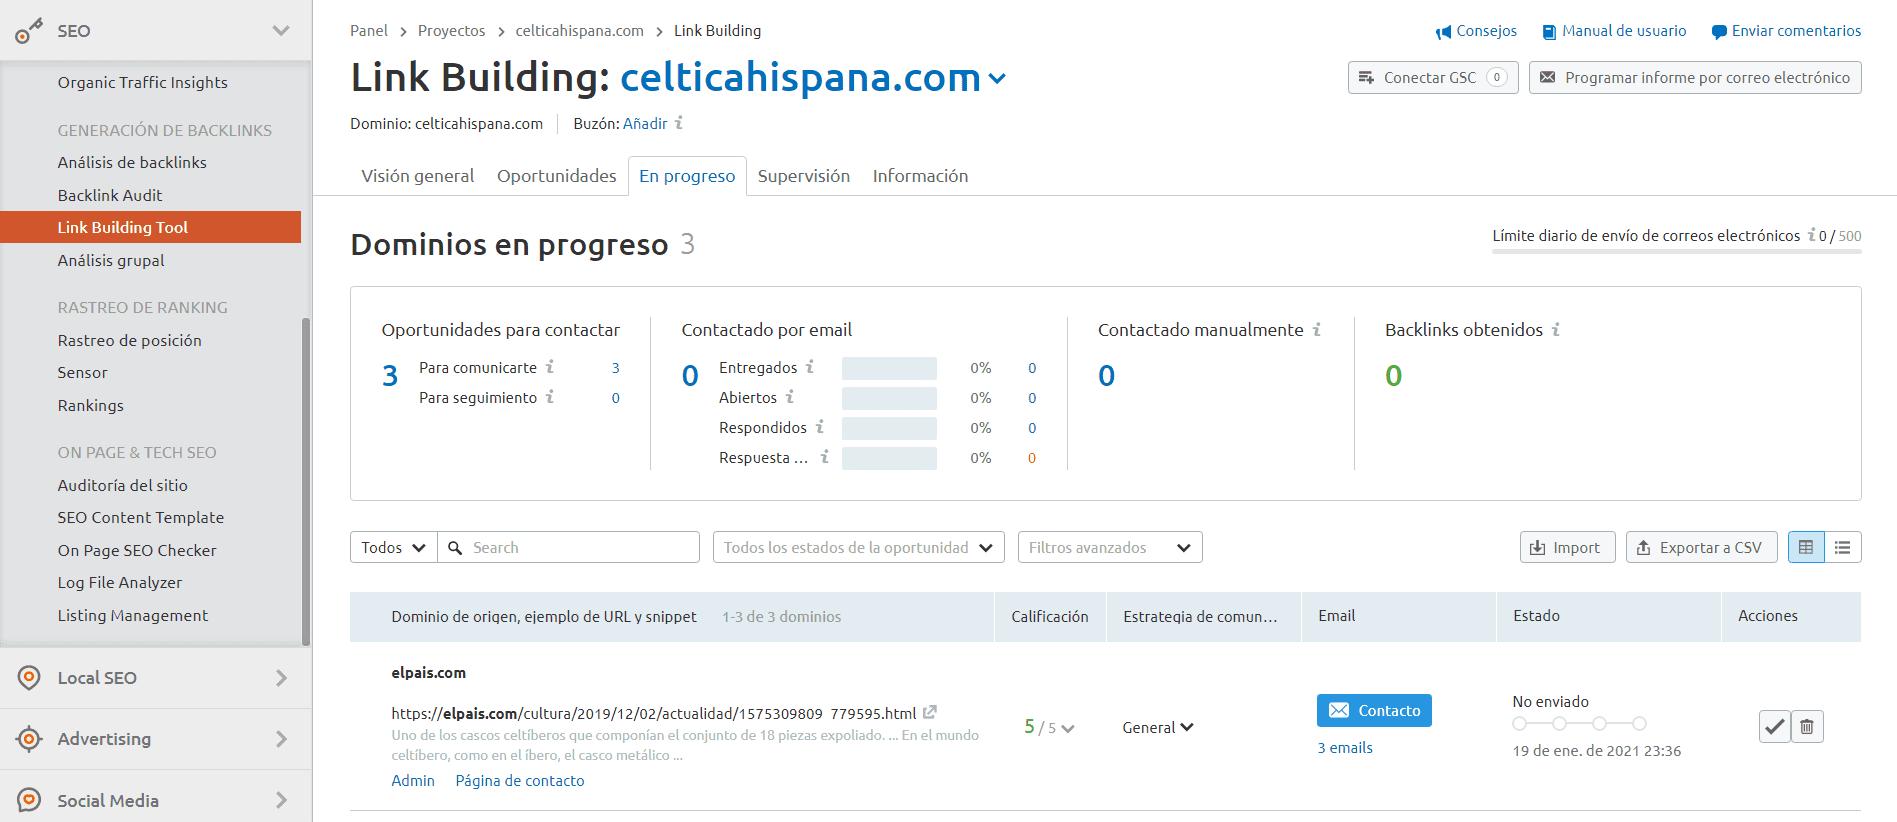 link building tool